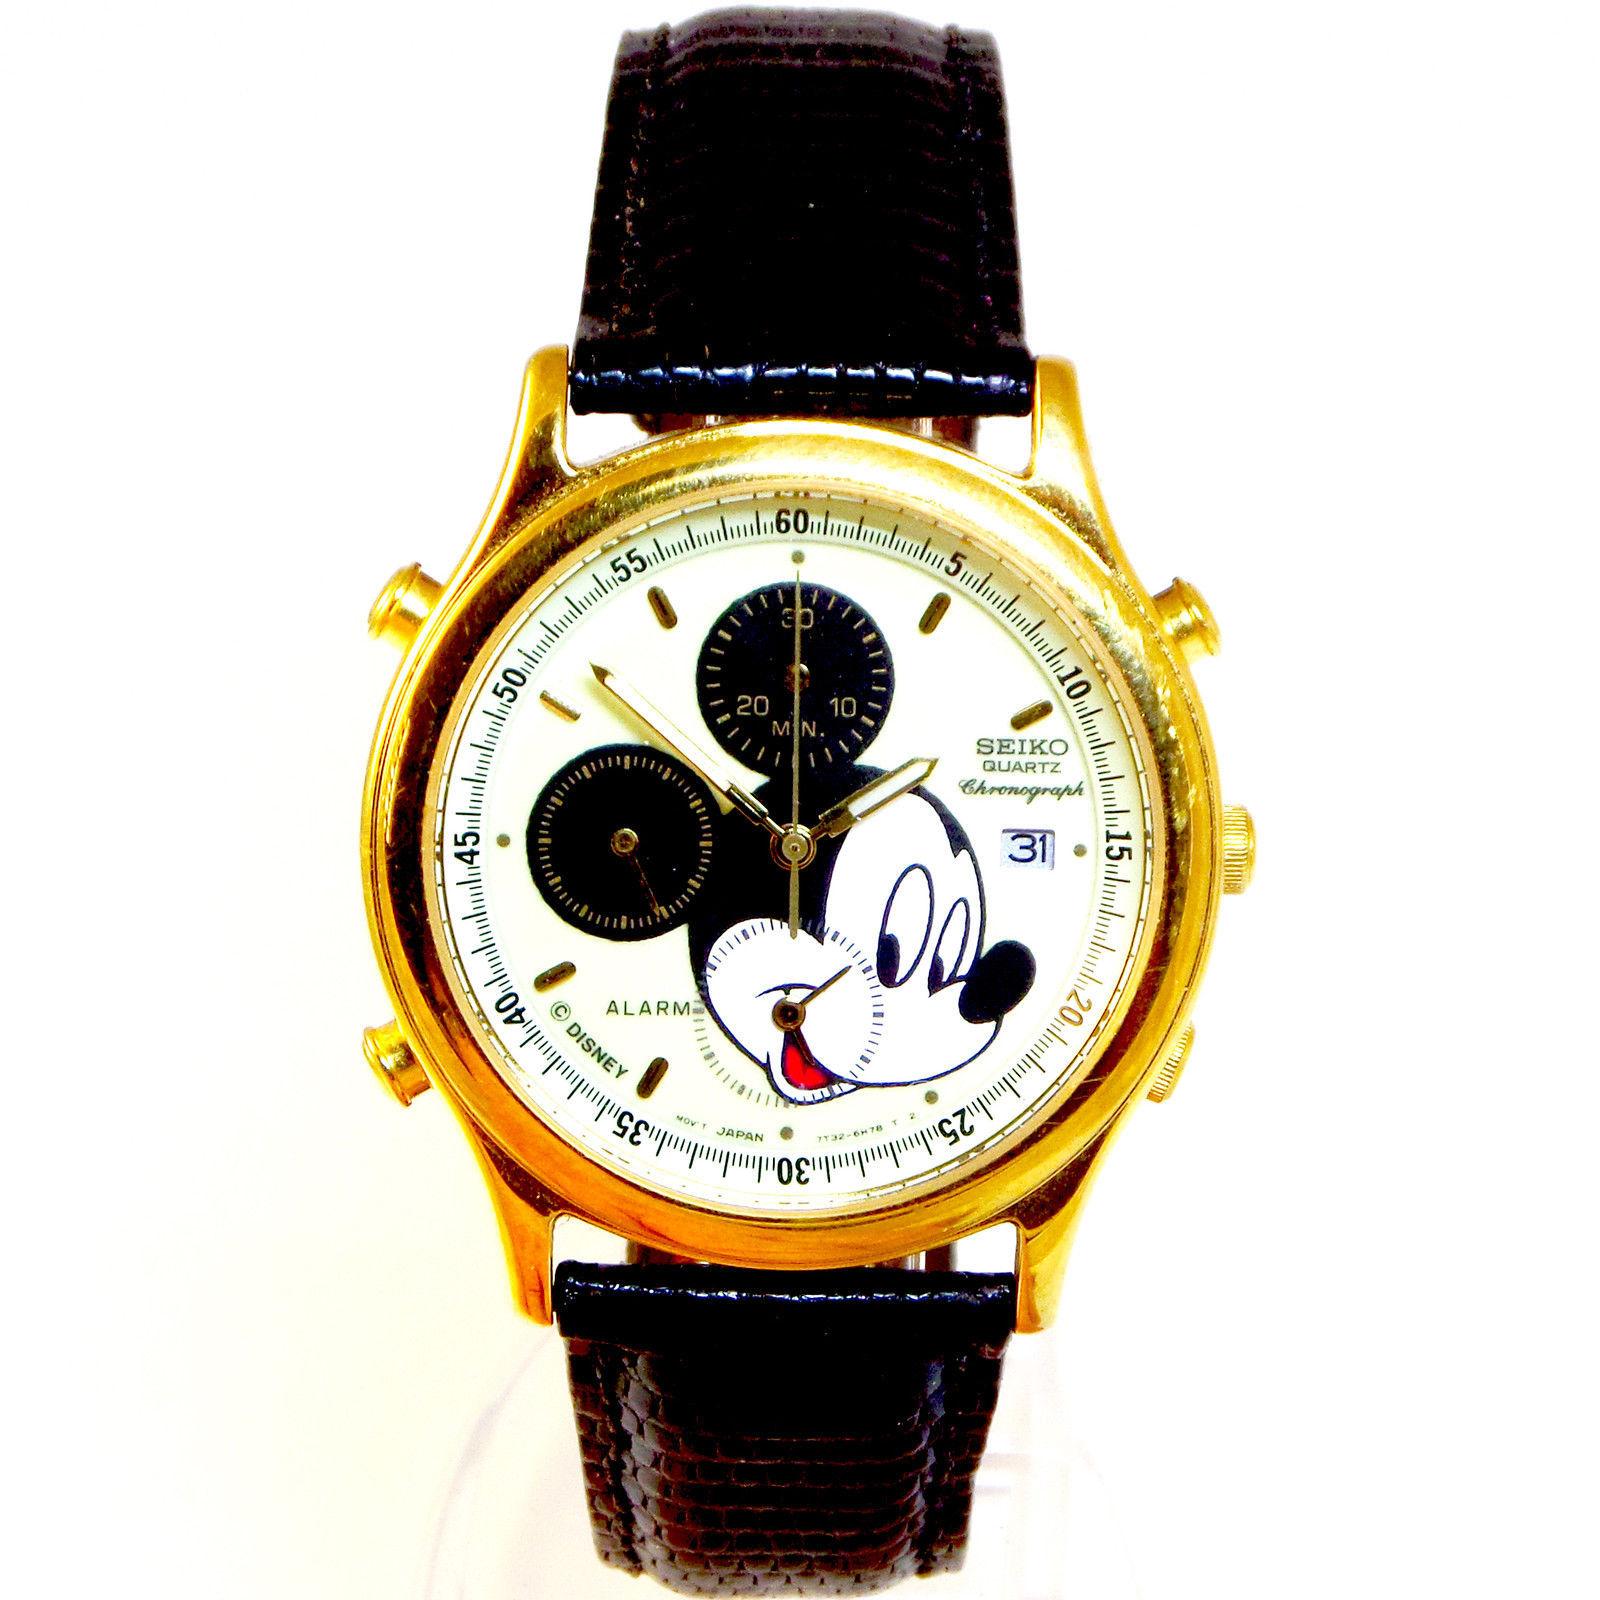 Seiko Mickey Chrono, Alarm, Men's Lumibrite Glow Rare Never Worn Watch Just $279